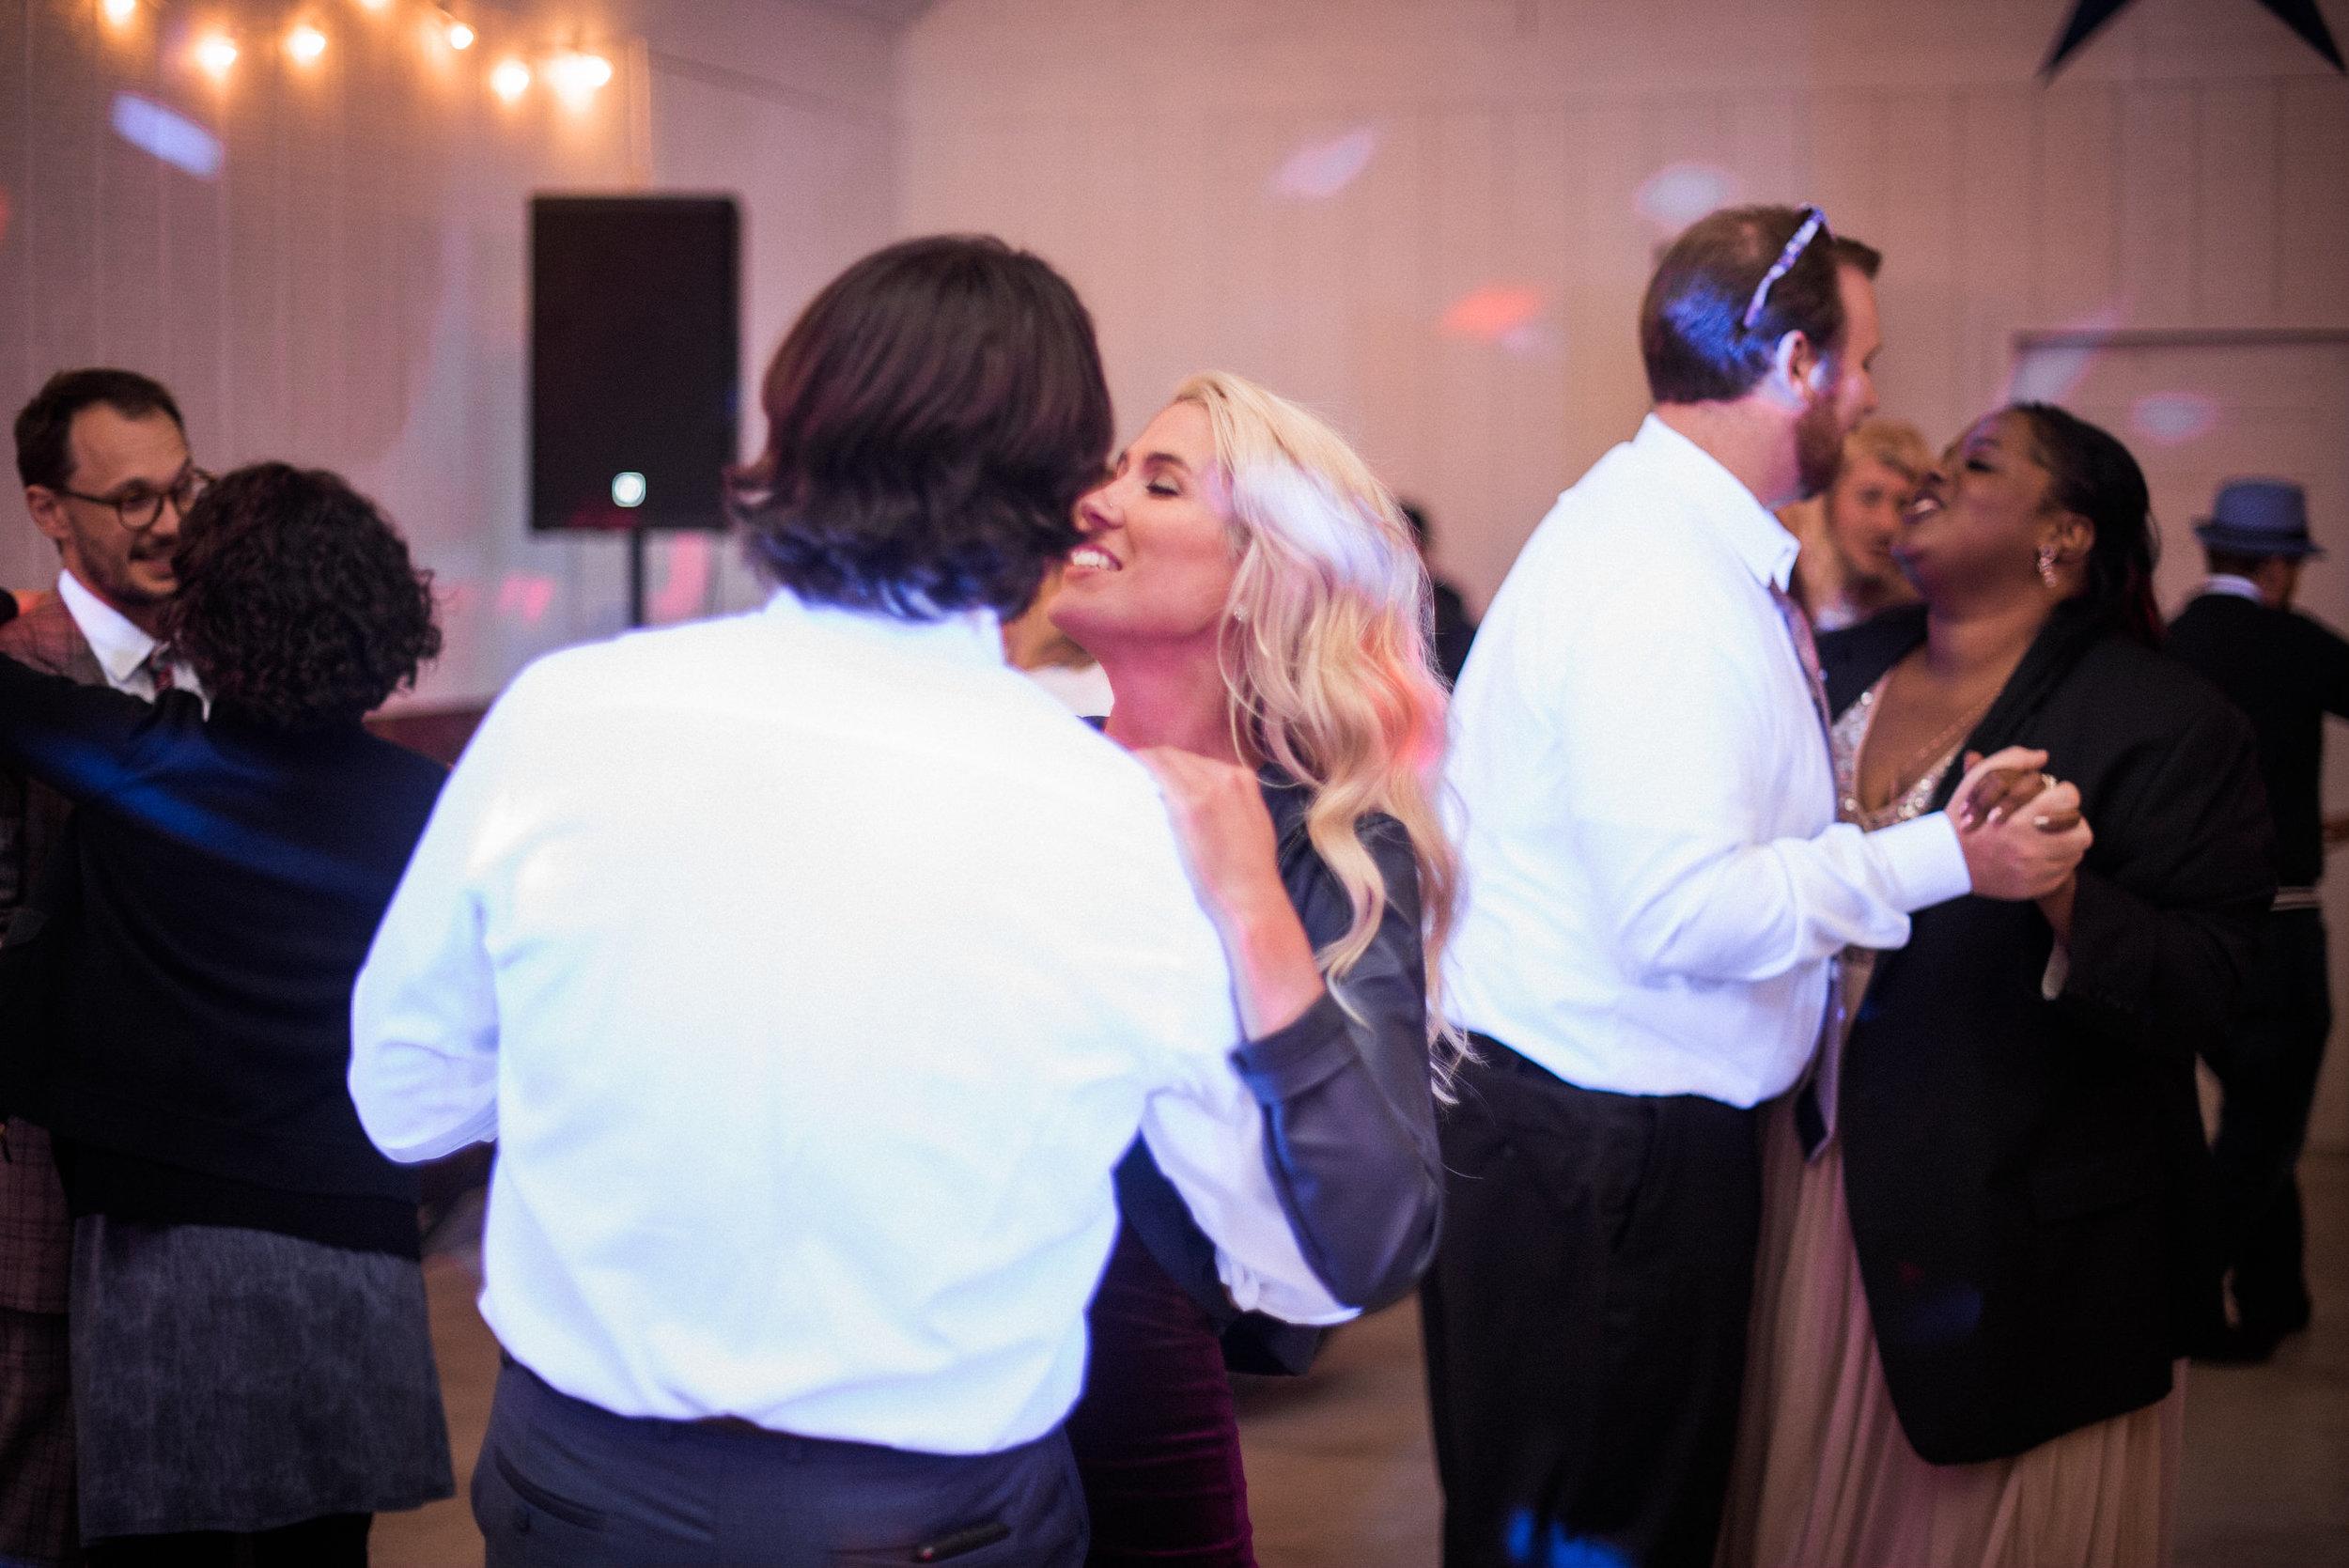 Wedding guests dancing in barn